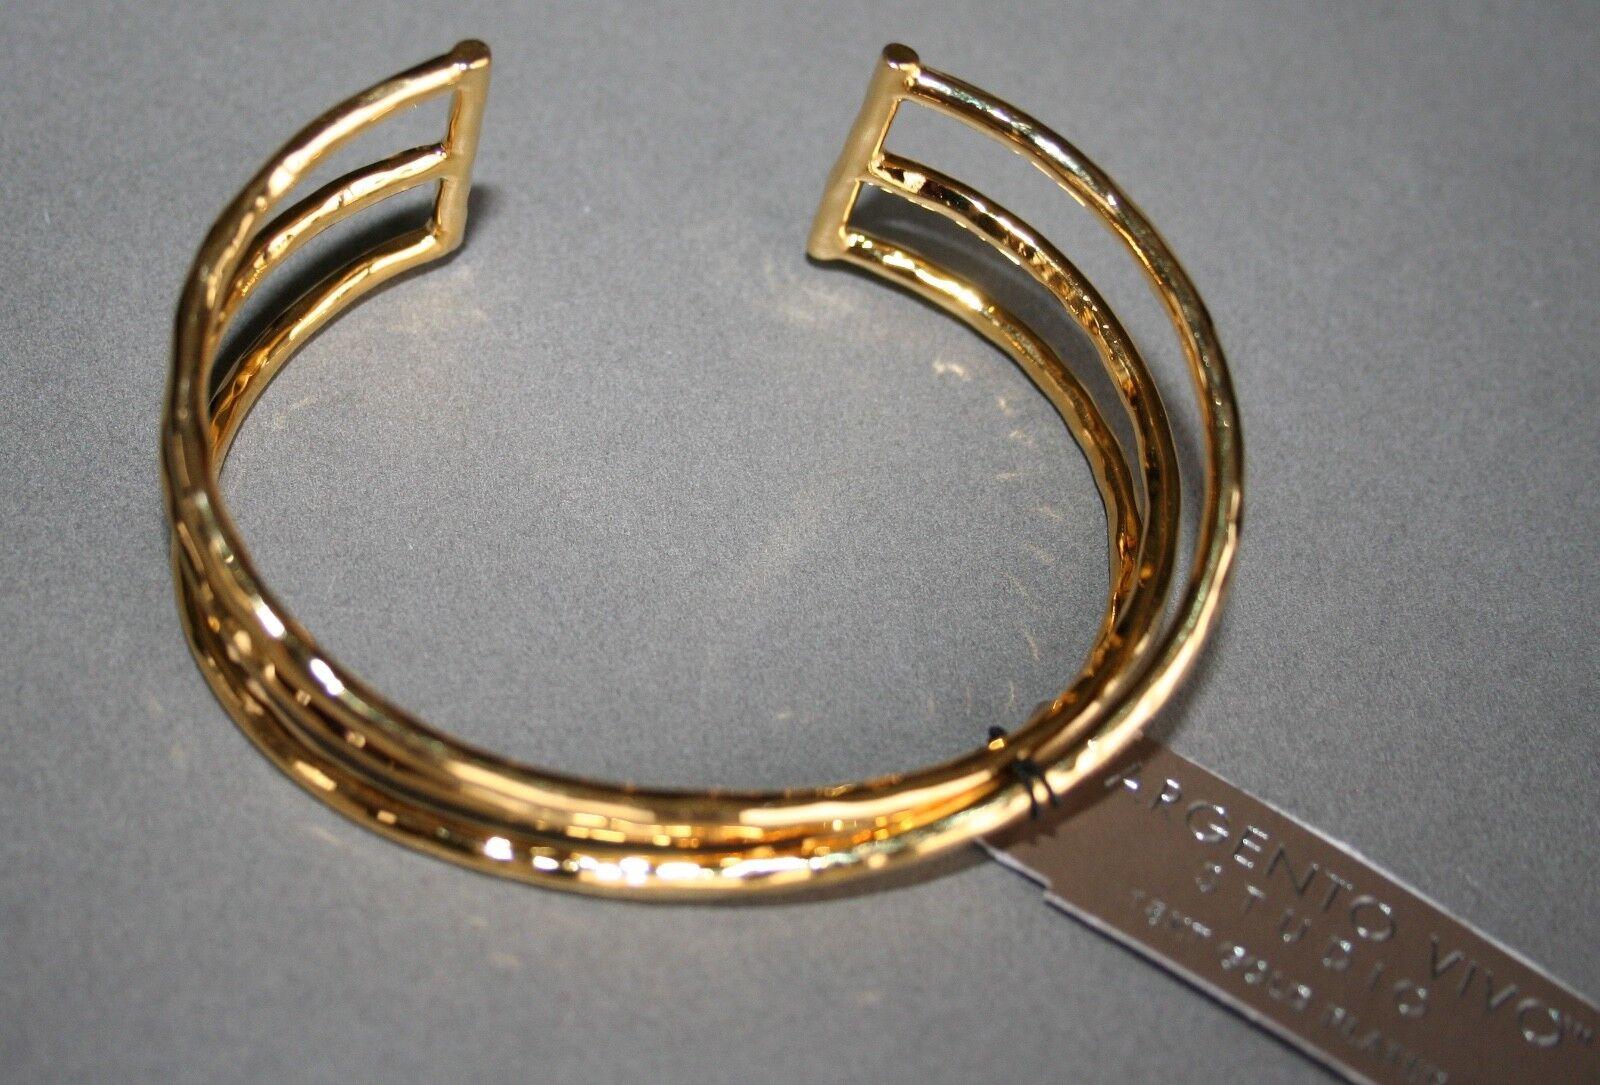 NWT- silver VIVO STUDIO HAMMERED 3 WIRE CUFF ADJUSTABLE BRACELET